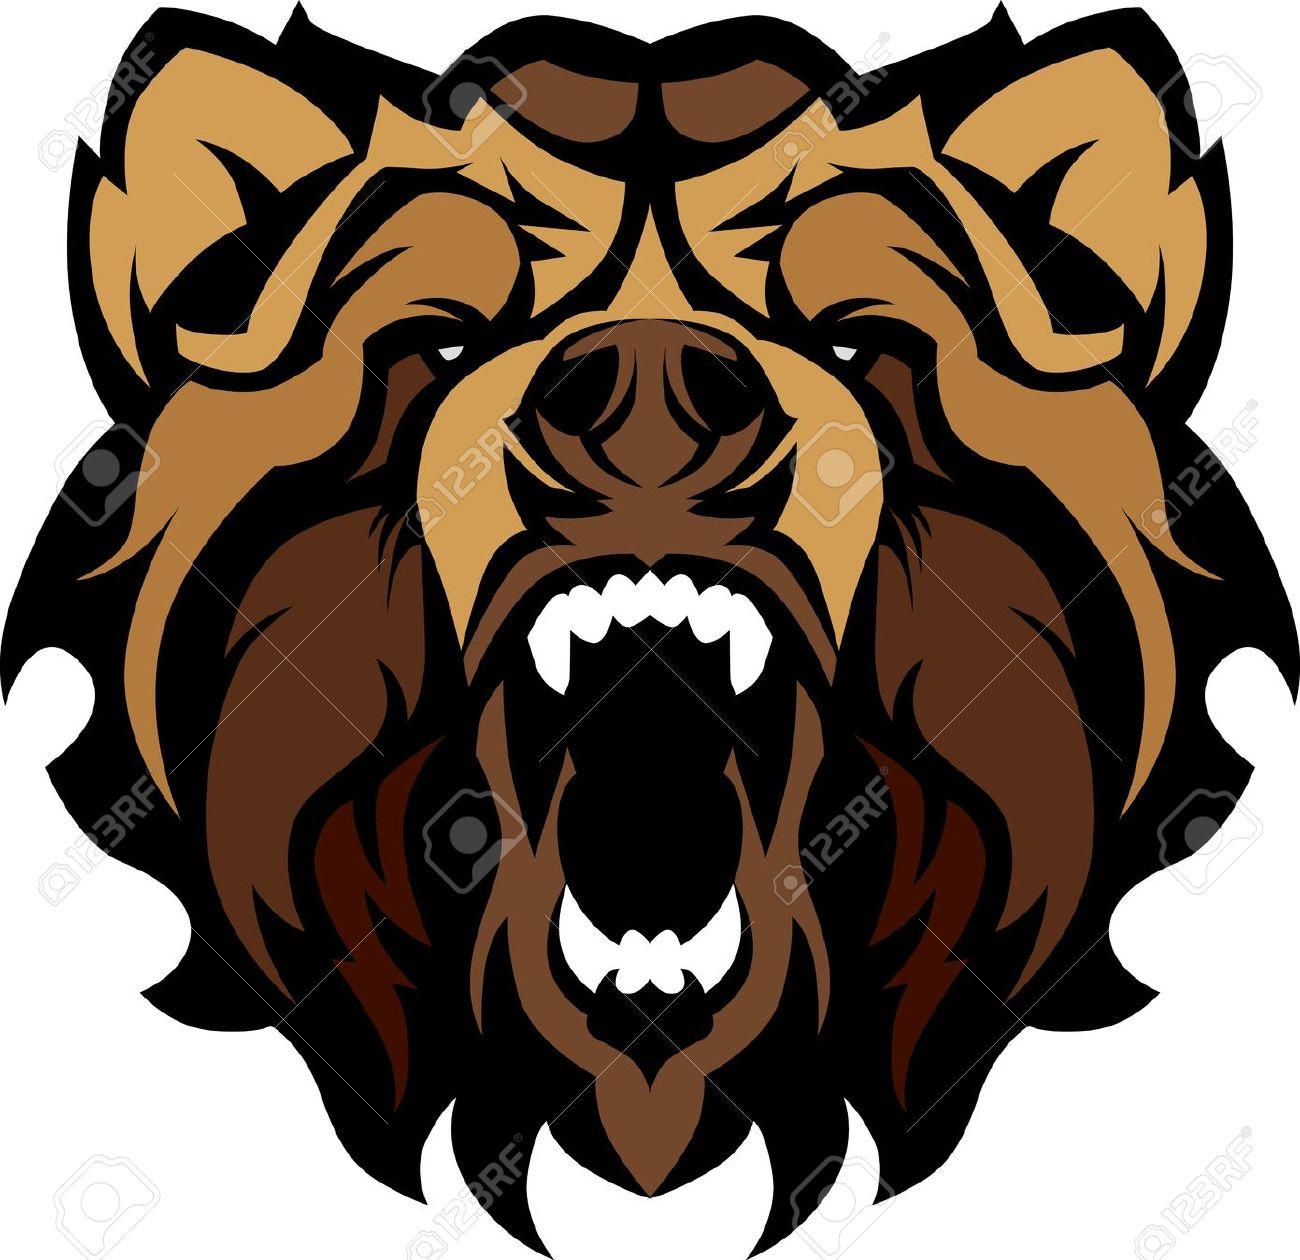 Black bear head clipart.